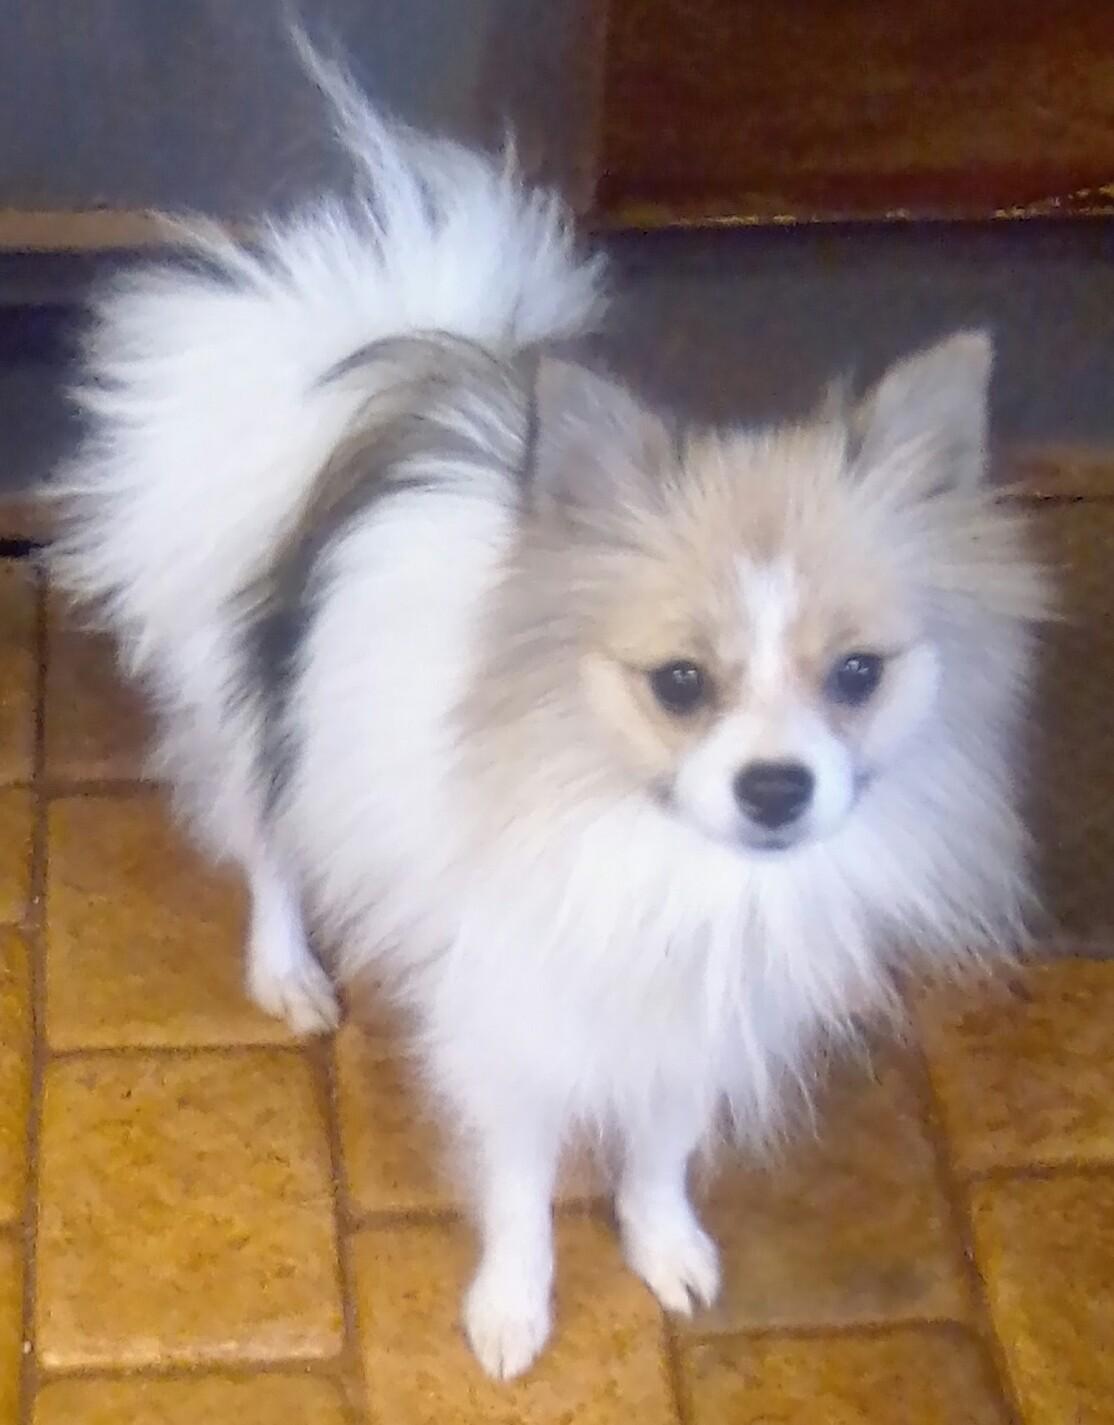 Tiny Male Toy Pomeranian puppy